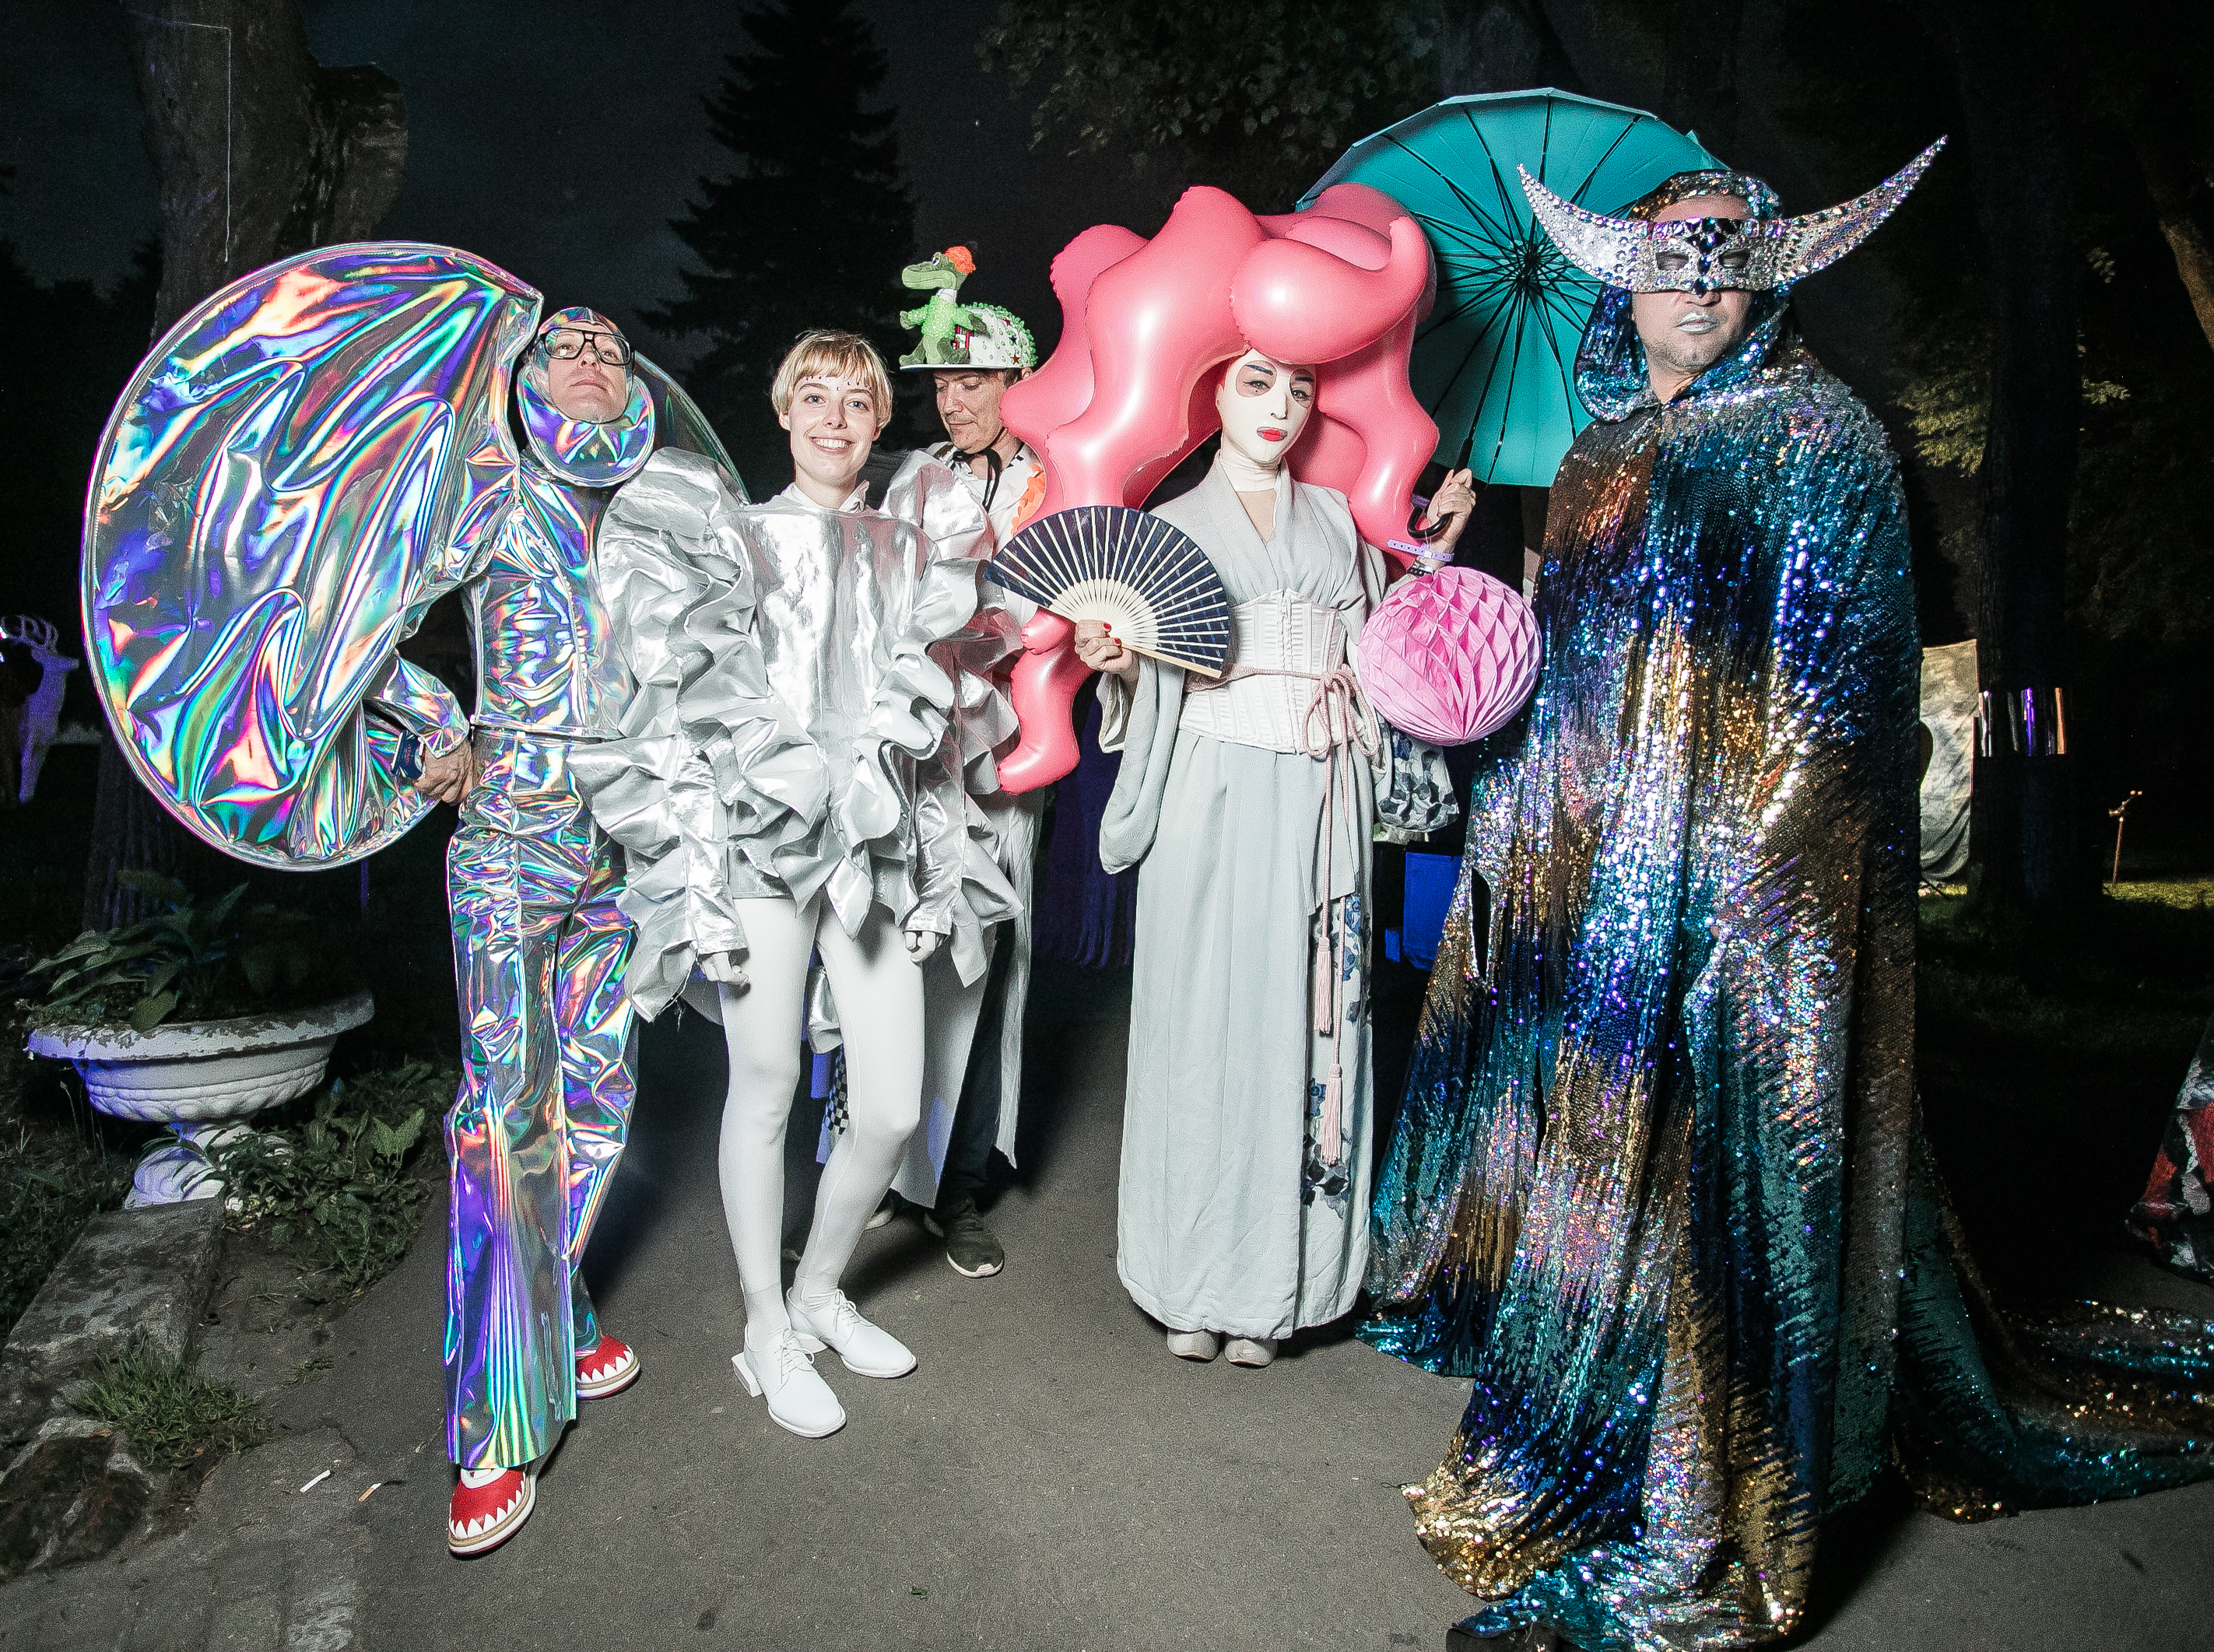 Thestatussymbol Com Fashion Art Film And Lifestyle